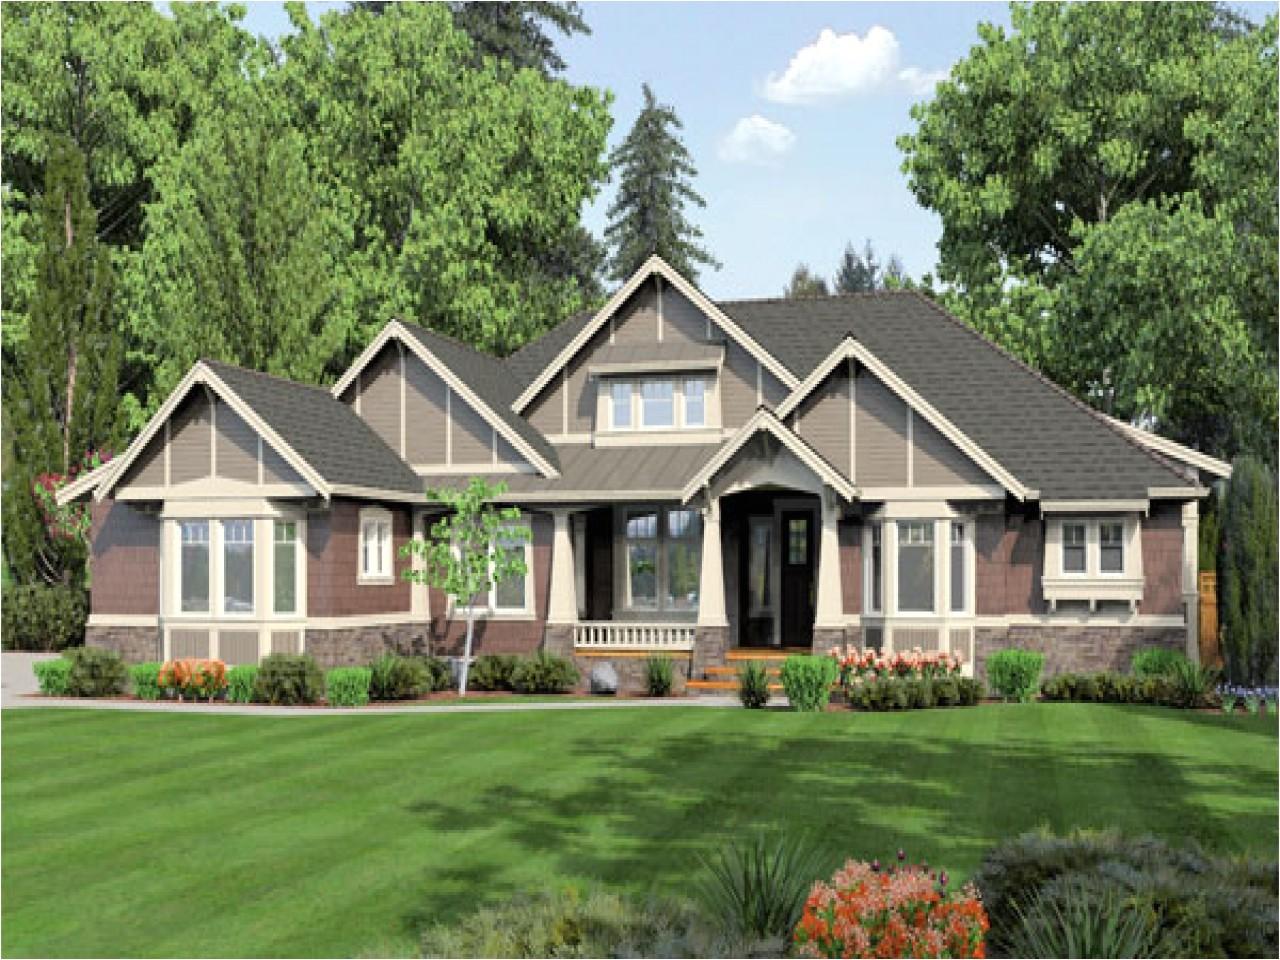 2da9d57edefa9100 one story ranch house plans one story brick house